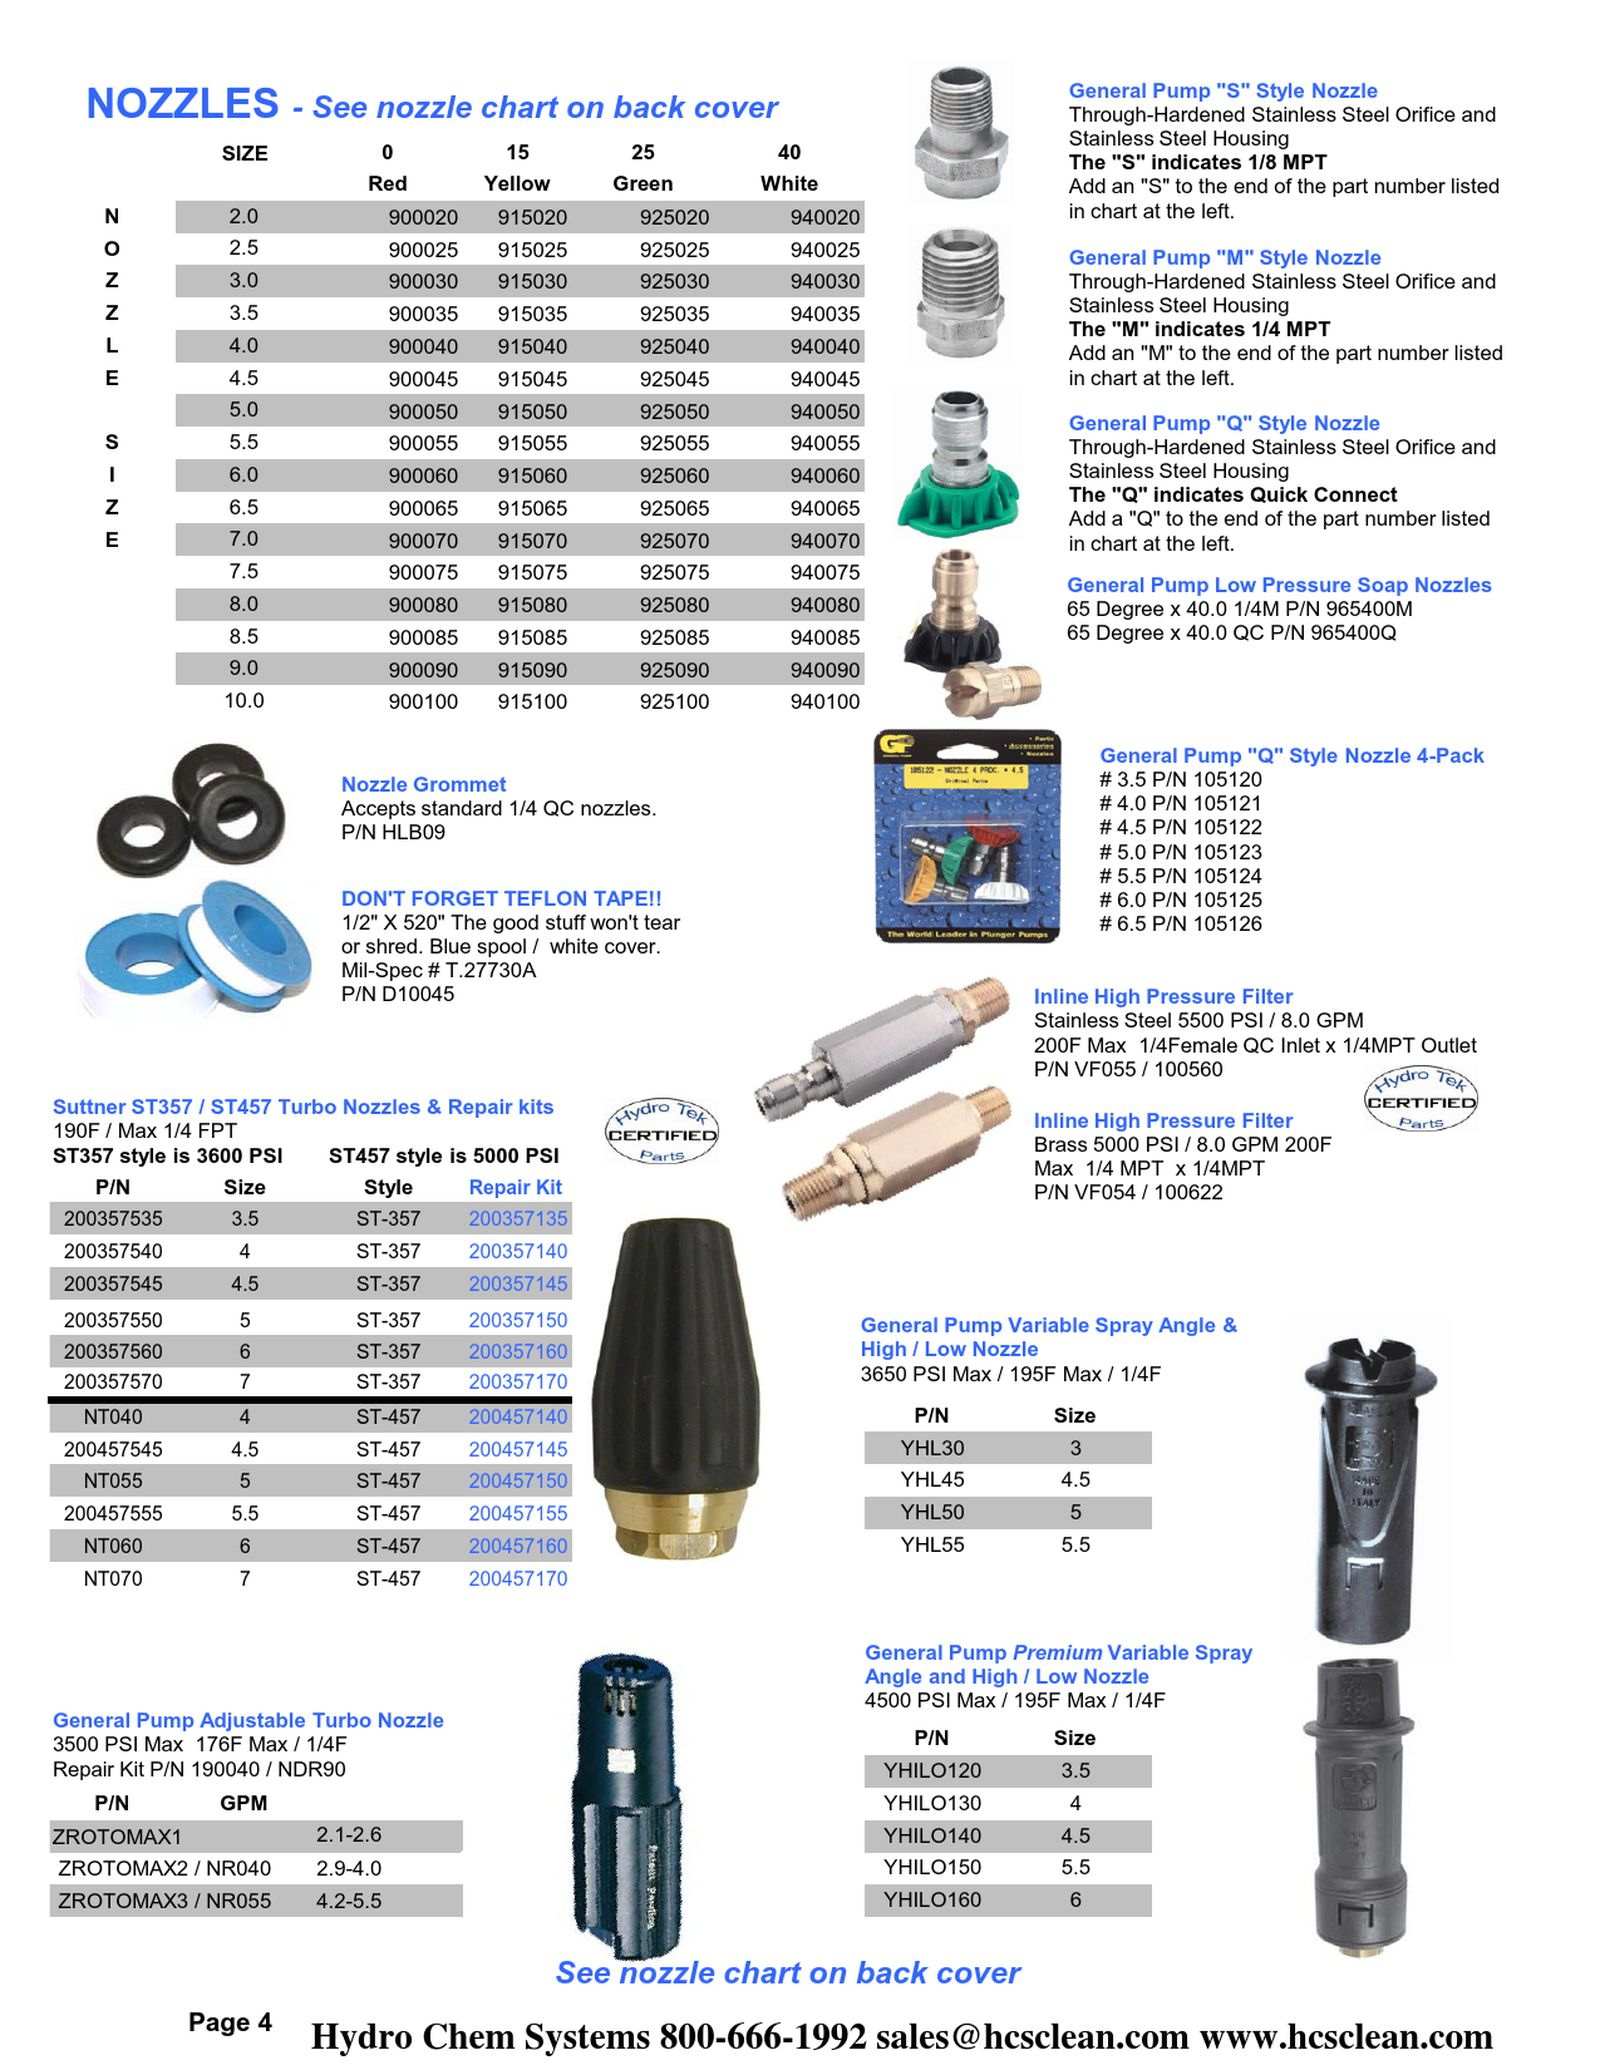 Hydrotek Pressure Washer Wiring Diagram Gallery Sample Accessories Download P 1 40 F